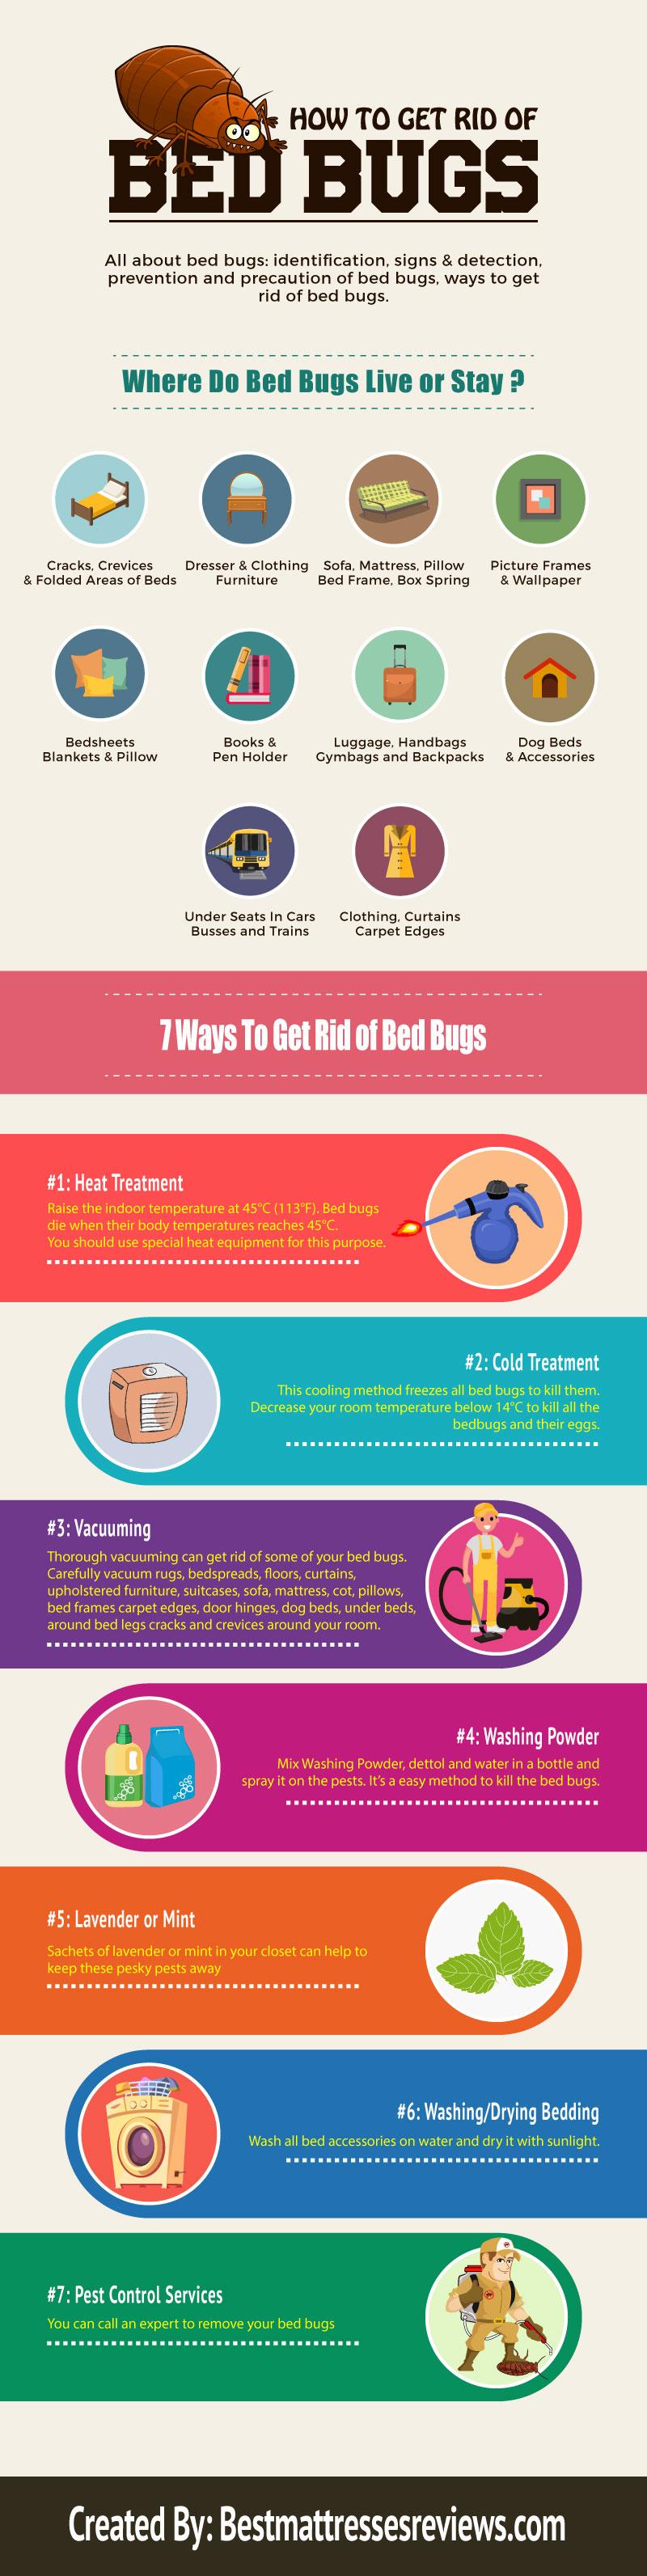 7 Practical Methods to Eradicate Bedbugs - Infographic